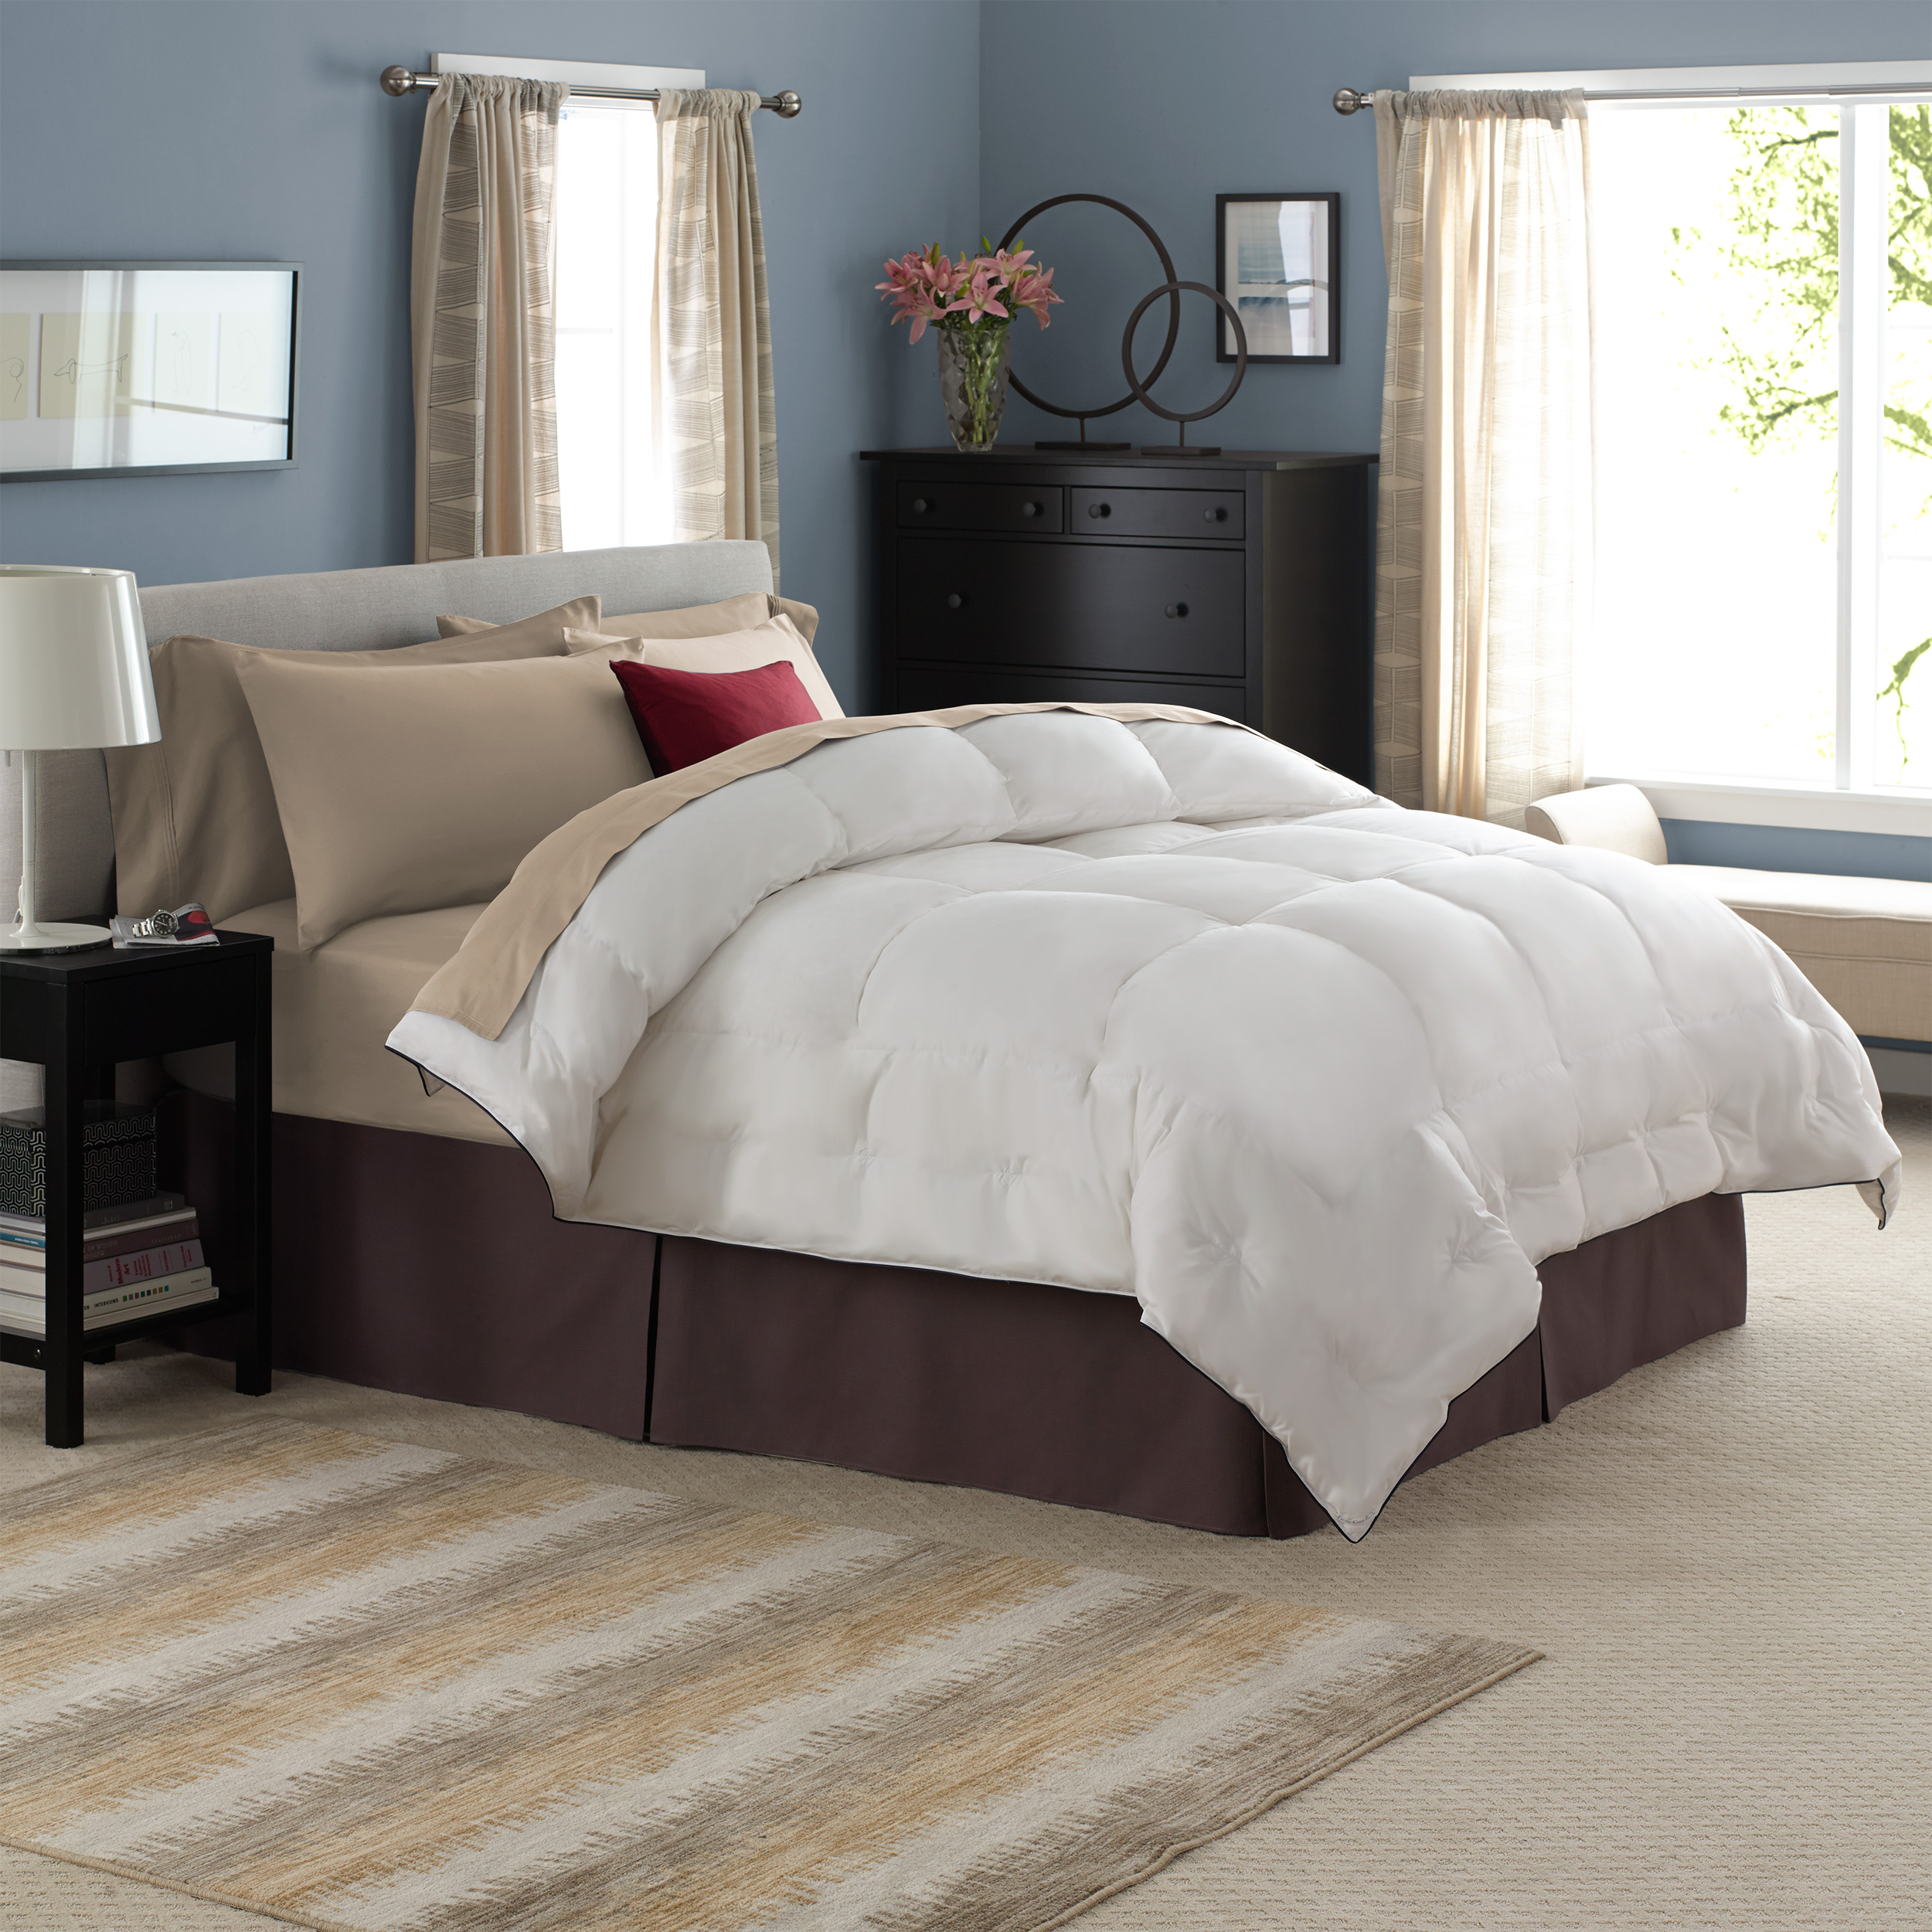 Shop Lunesse Comforter